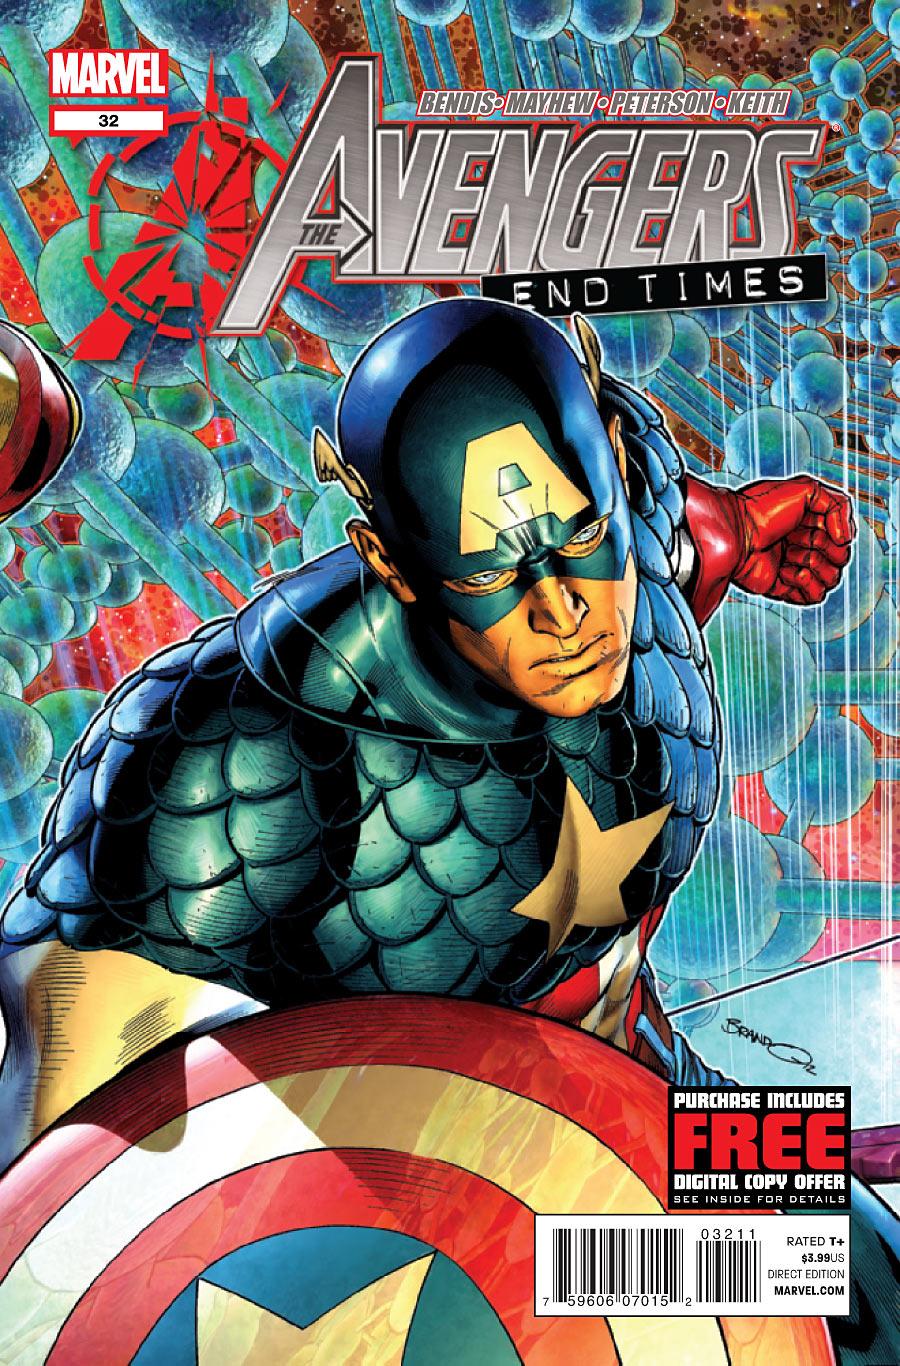 The Avengers 32